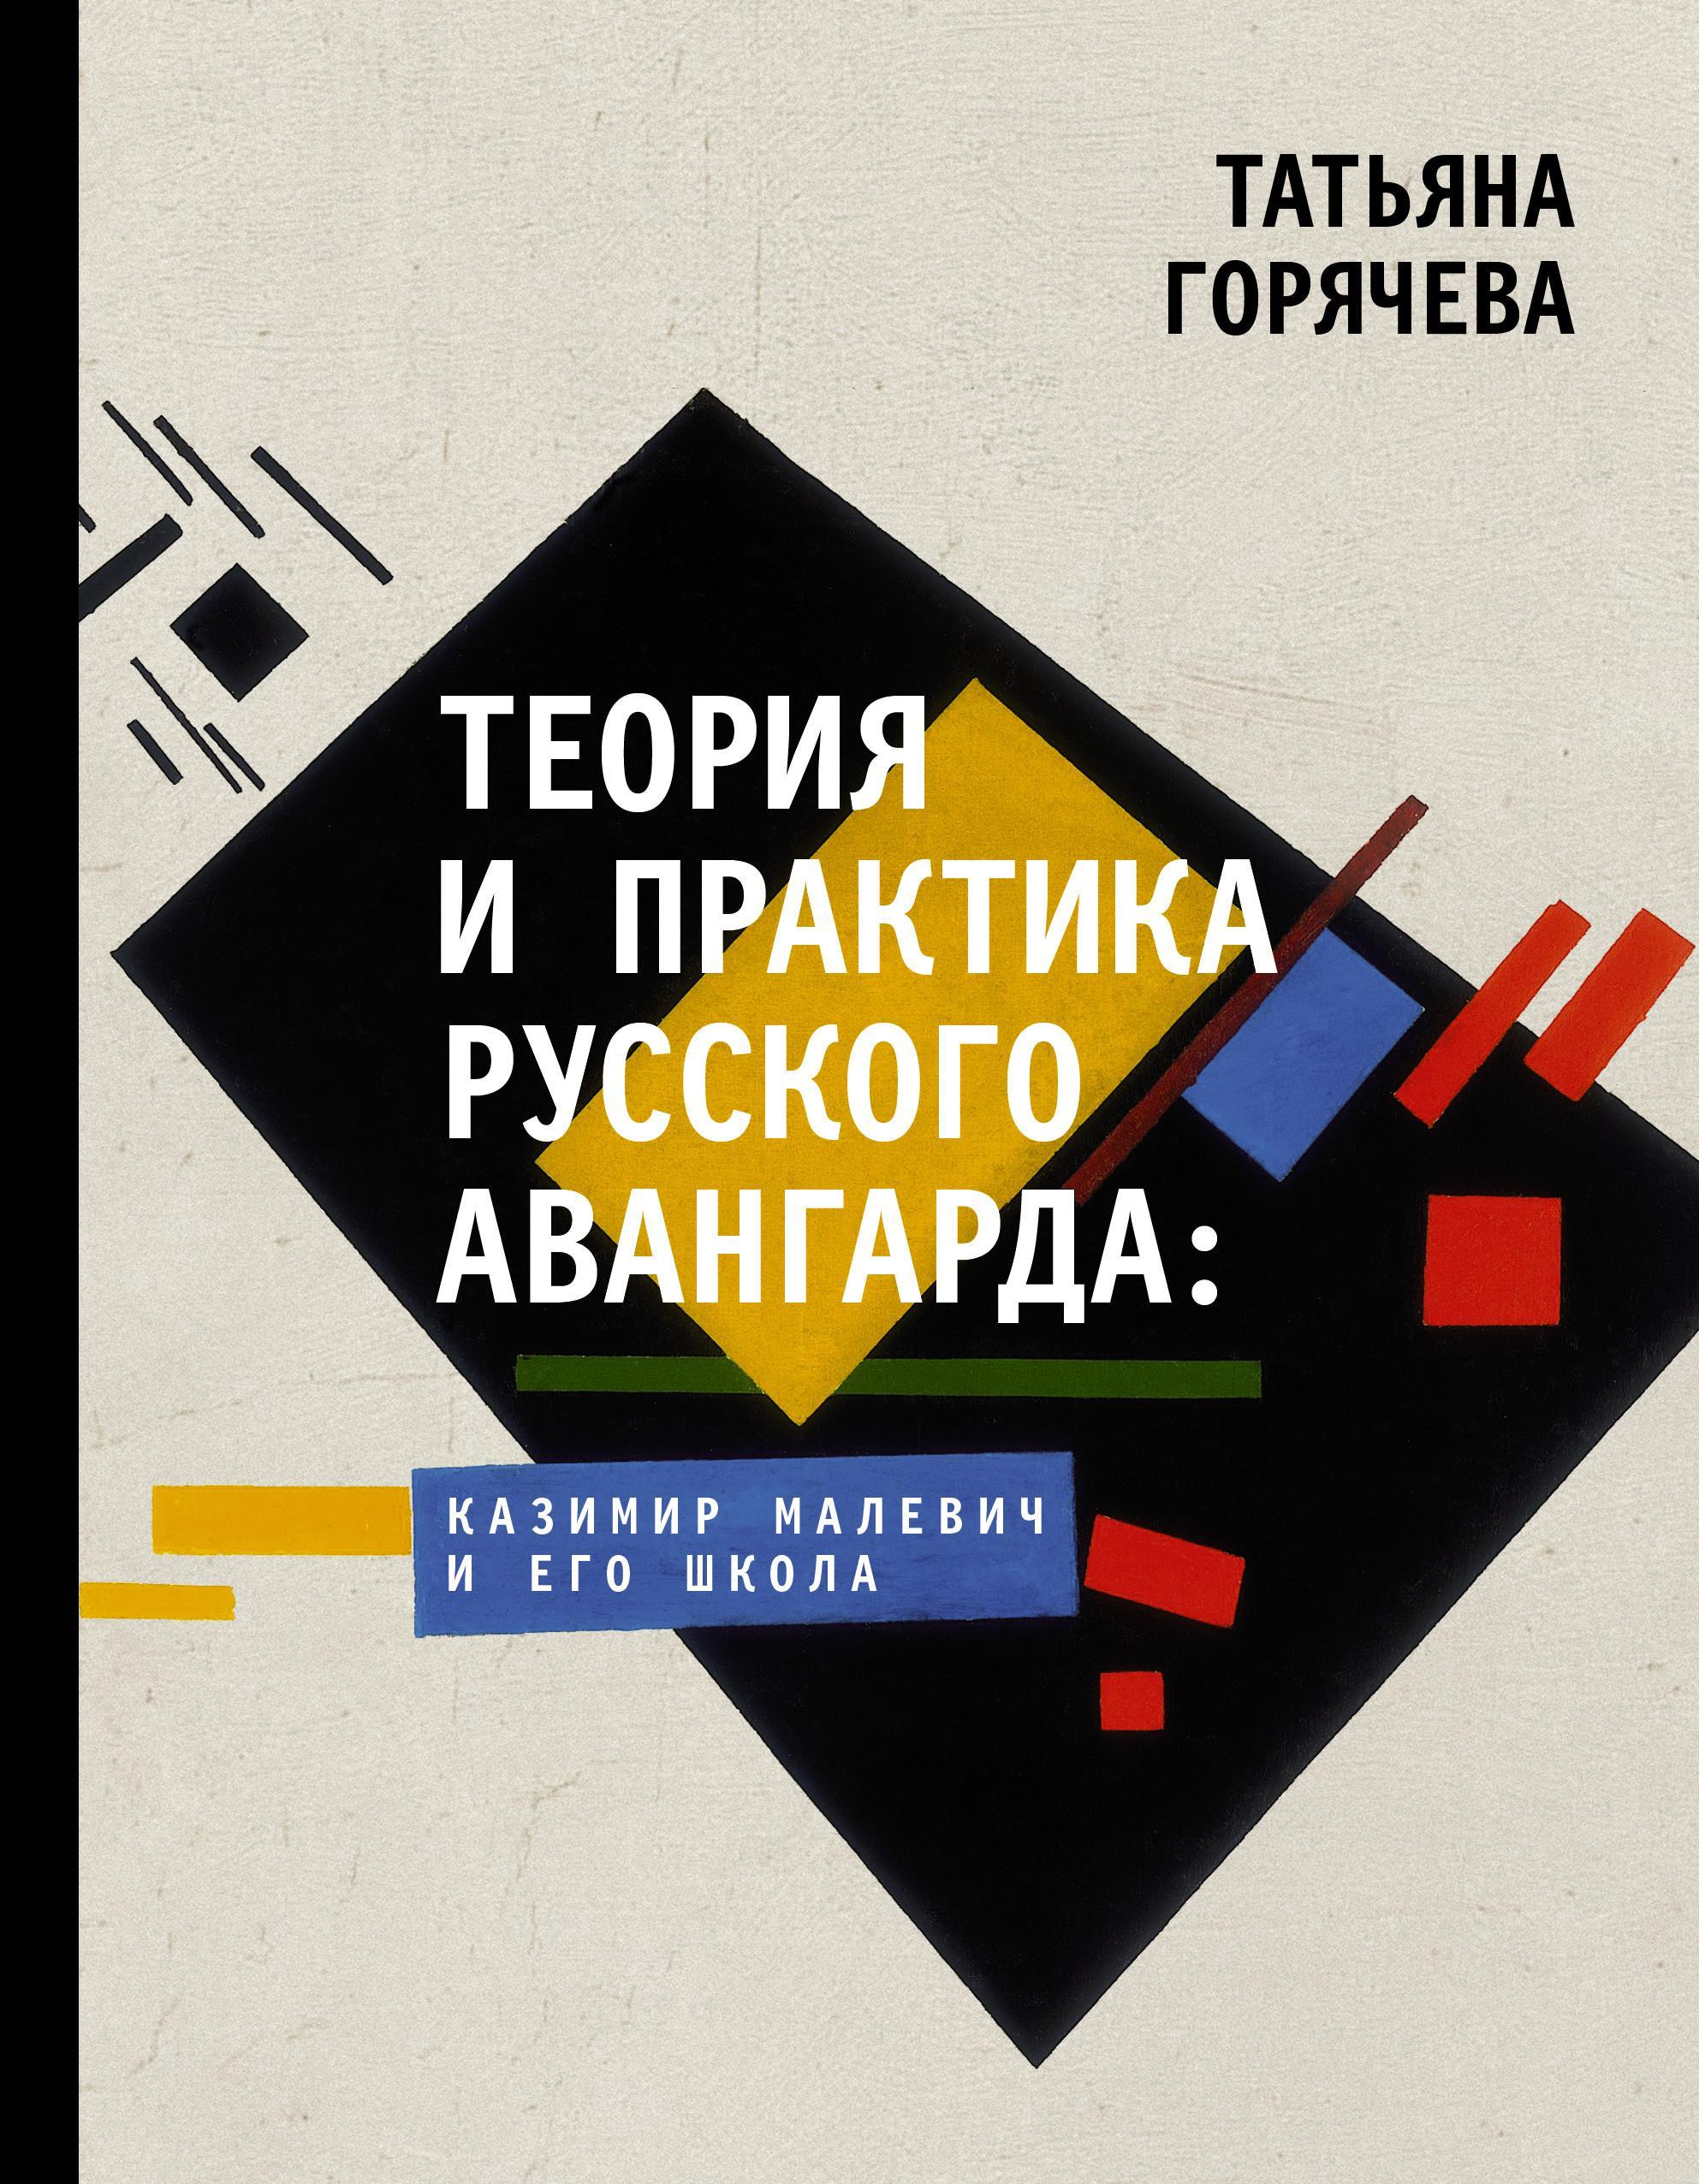 Теория и практика русского авангарда: Казимир Малевич и его школа